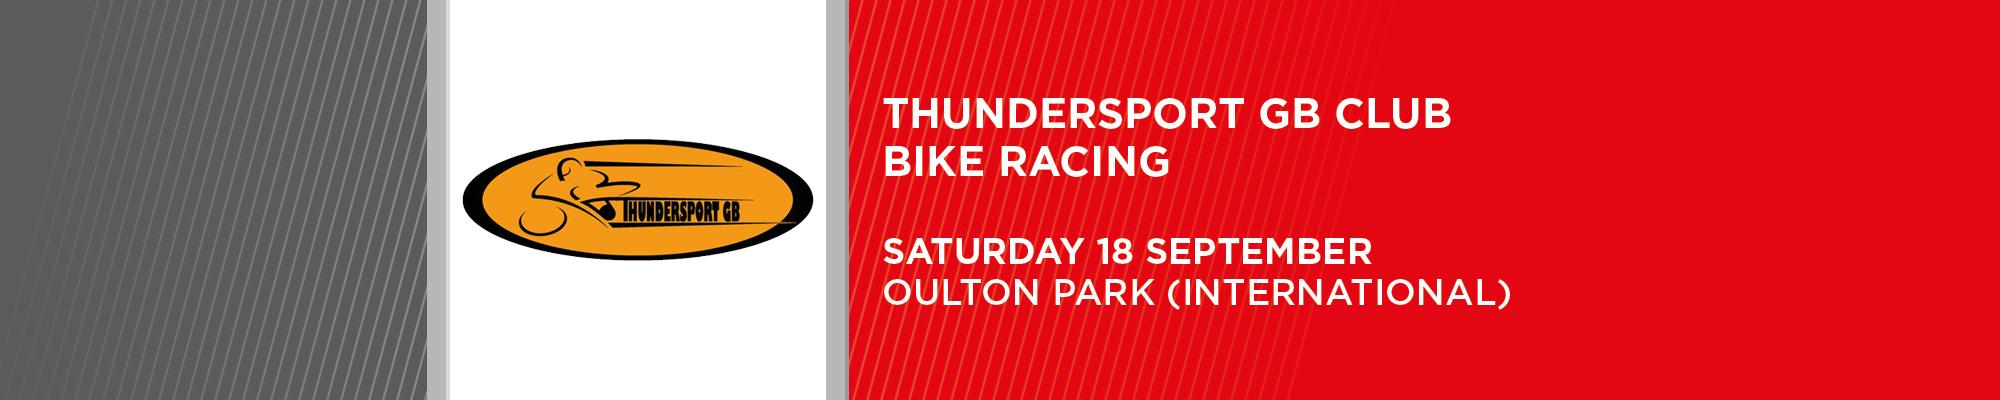 Thundersport GB Club Bike Championships